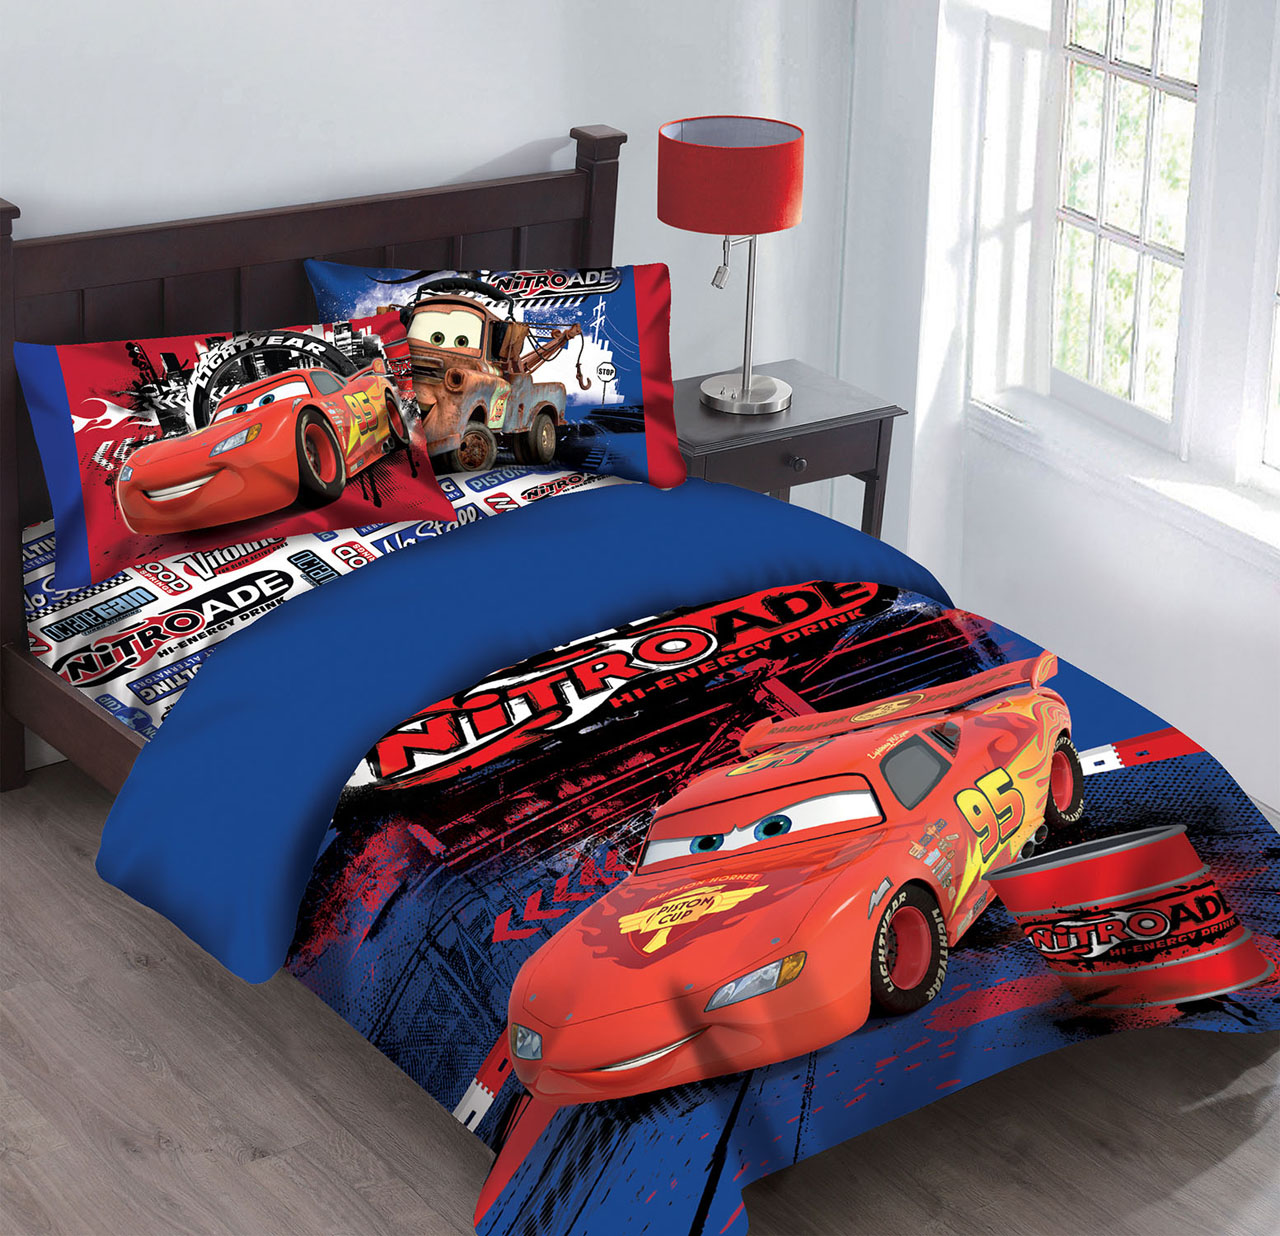 Disney Cars Nitroade Twin Bedding Comforter Set   Walmart.